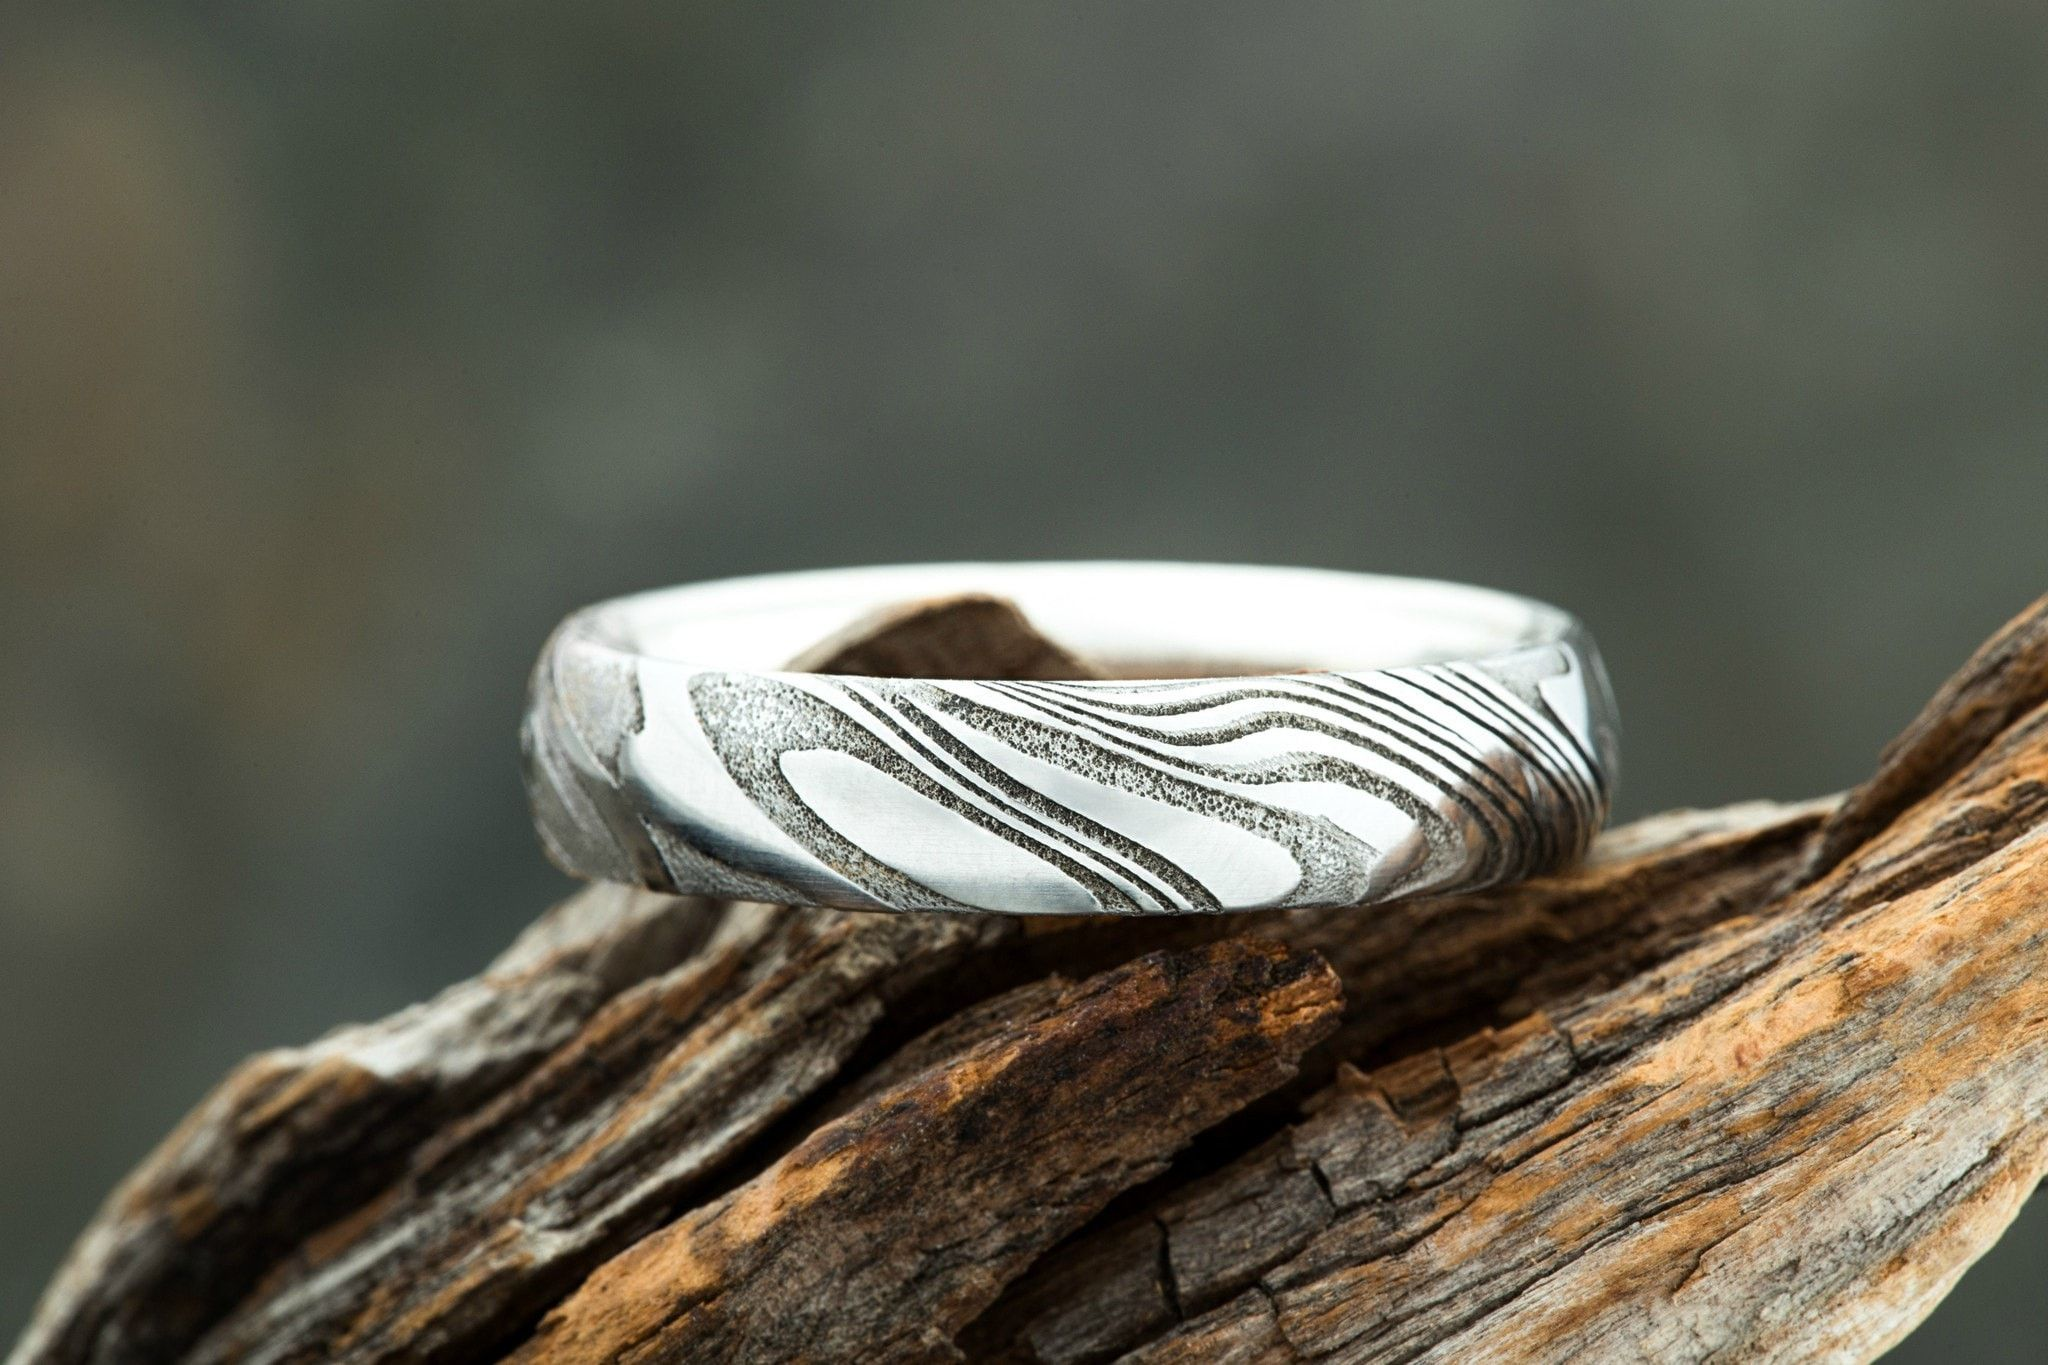 Wood Grain Damascus Steel Ring W Silver Interior By Carbon 6 Rings Woodgrain Mens Wedding